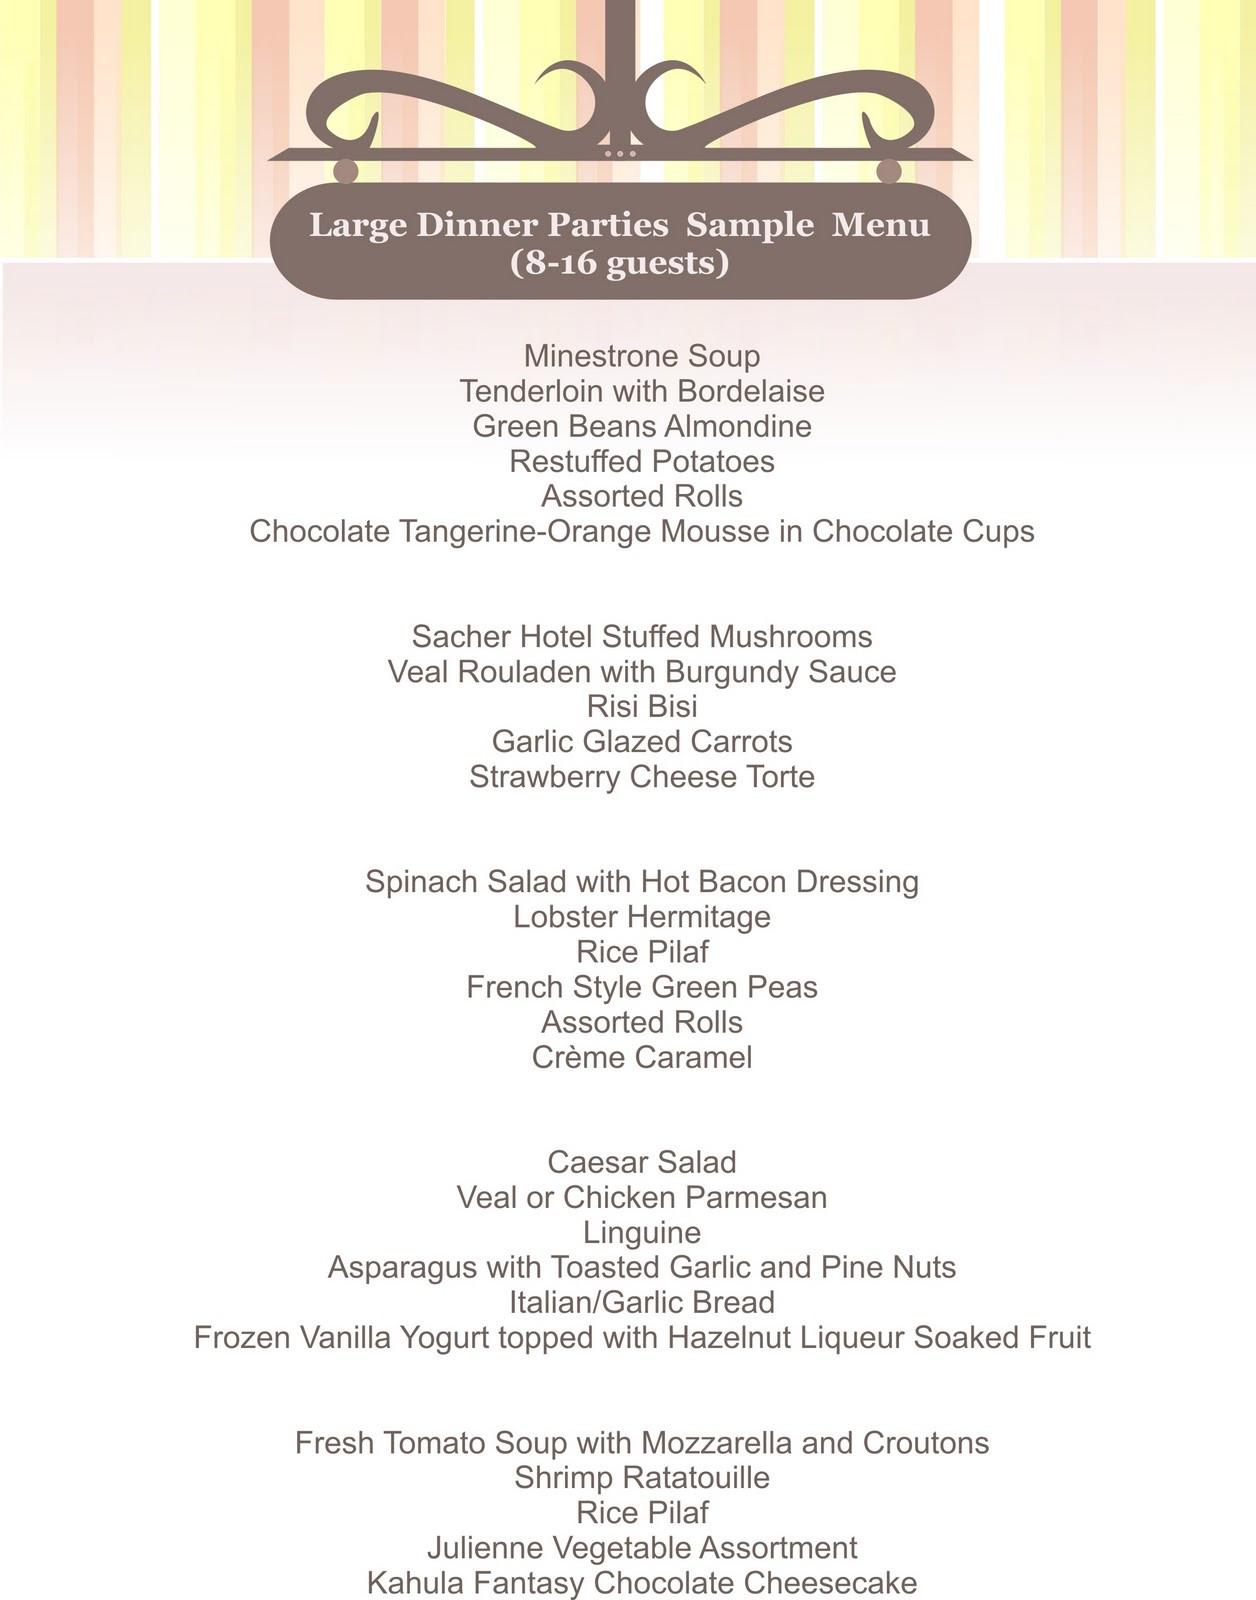 Dinner Party For 8 Menu Ideas  Mel s Cuisine The Cornucopia Catering